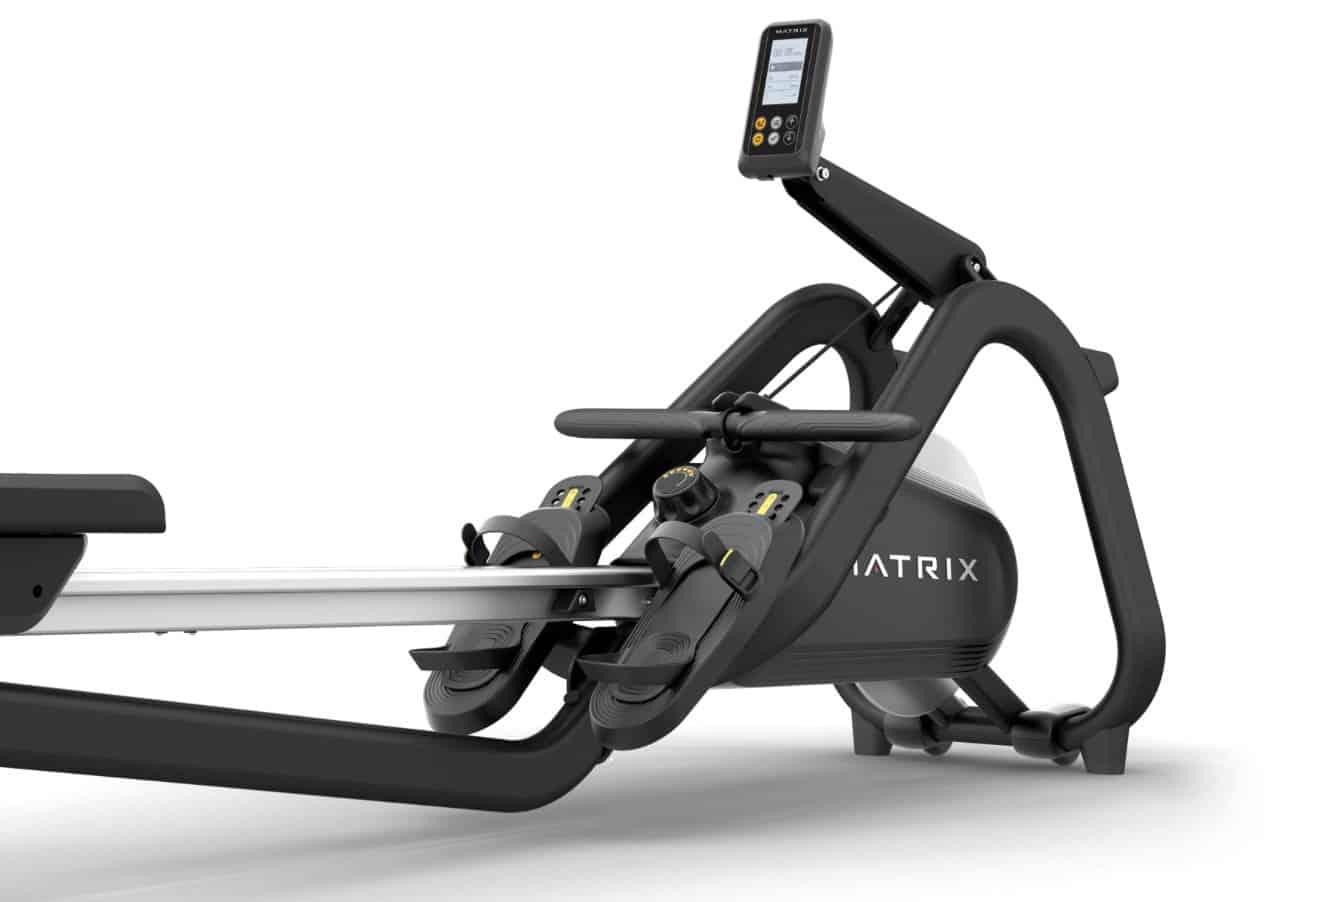 Matrix Rowing Machine